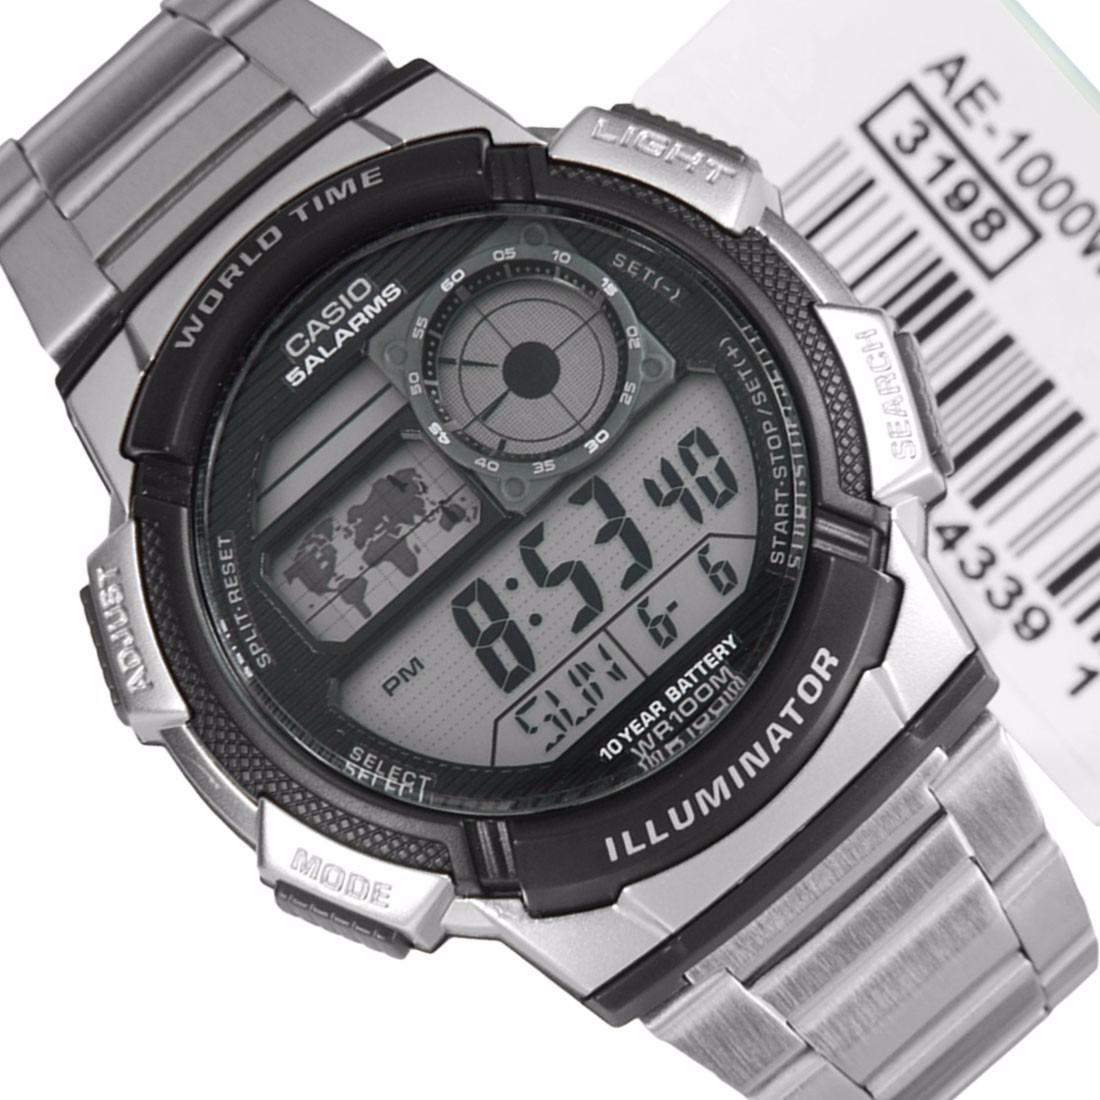 Reloj Casio Caballero Digital Alarma Crono Luz Mod Ae 1000wd